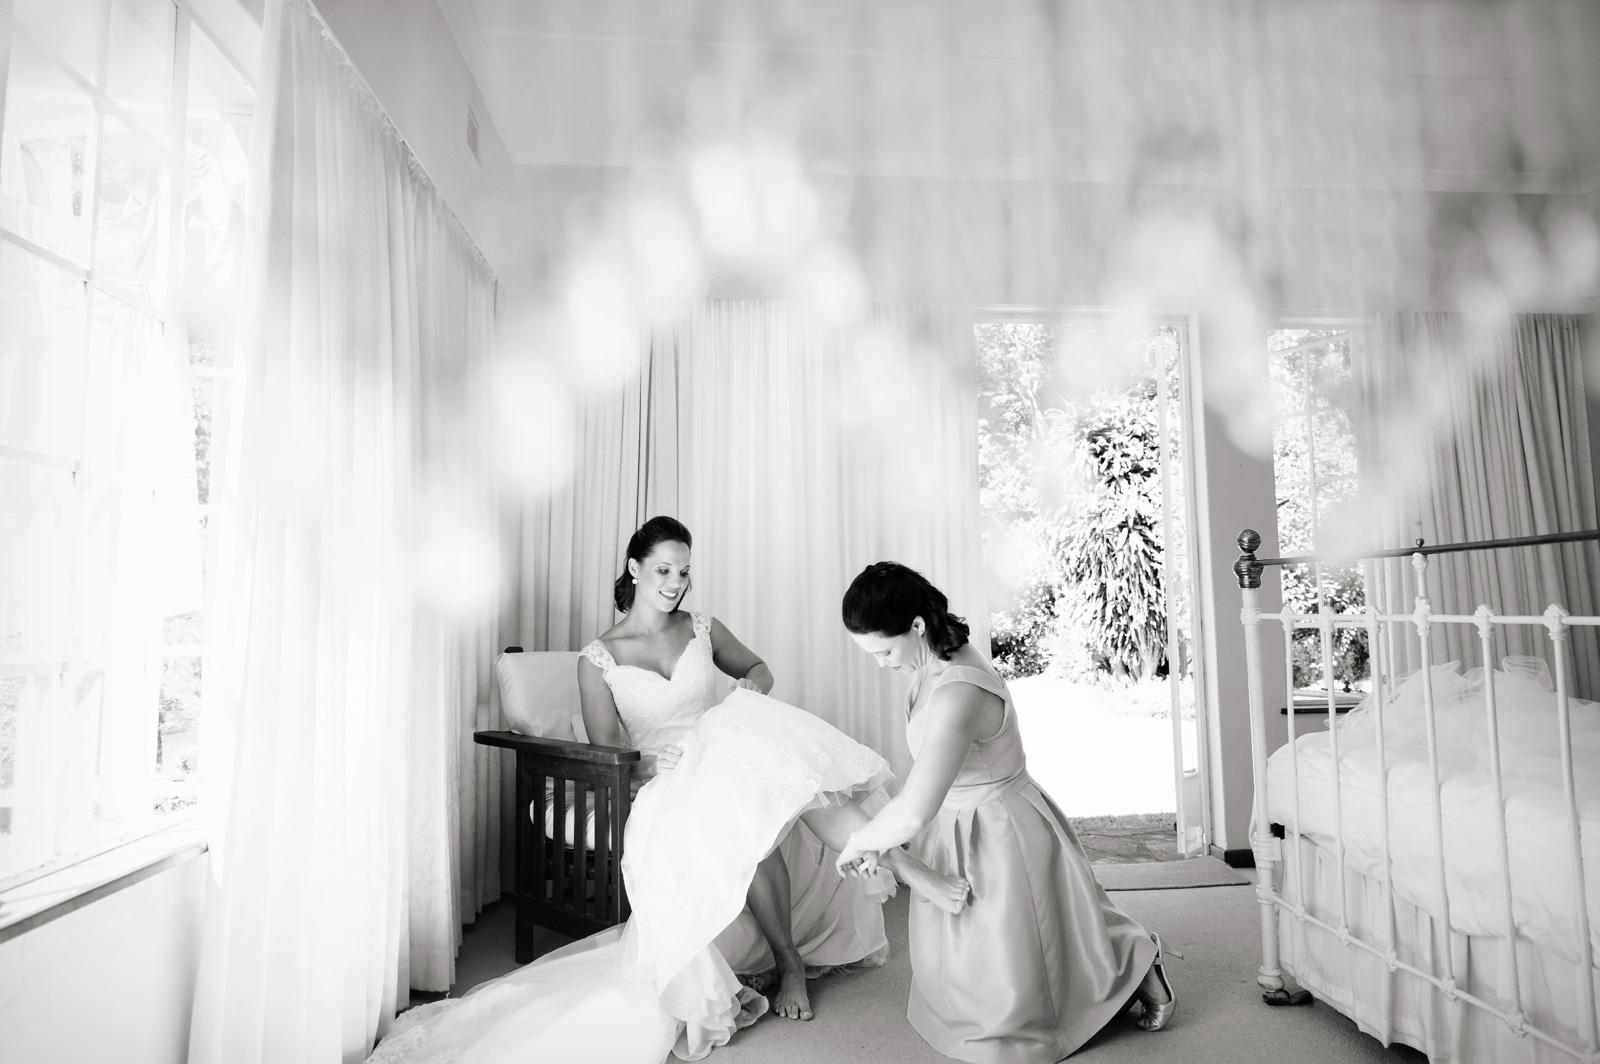 Talloula Documentary Wedding Photography Bride